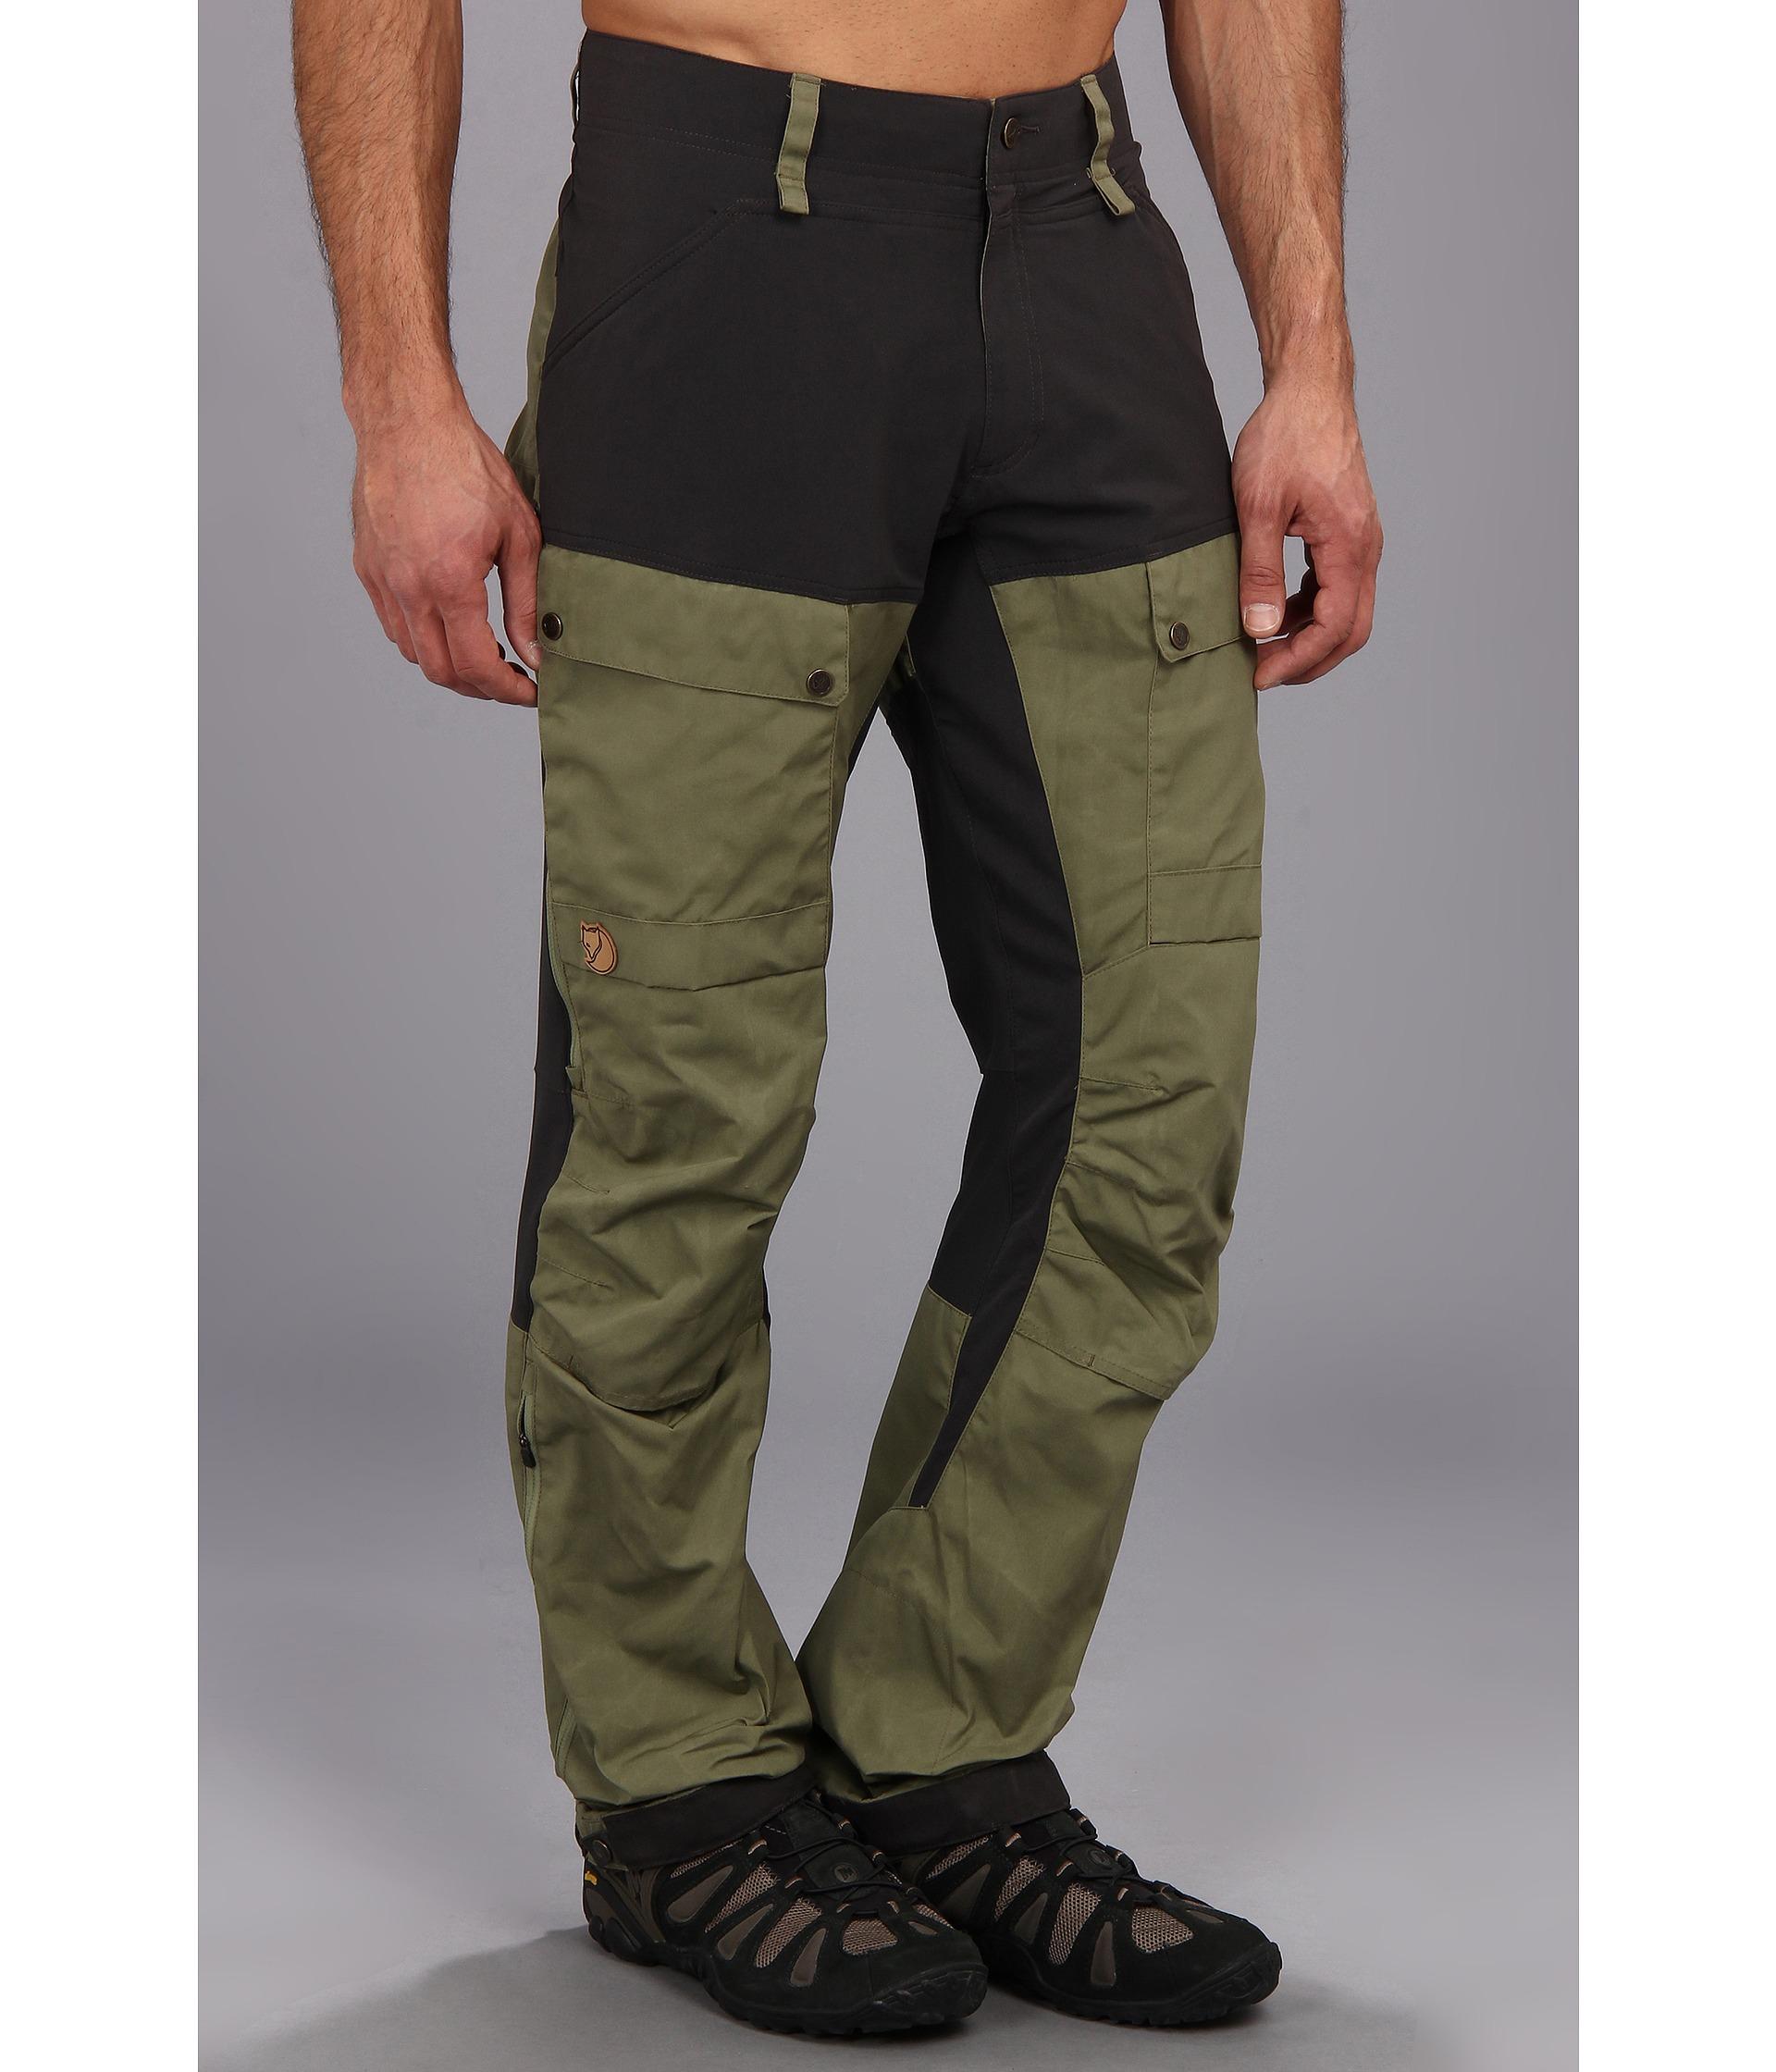 Low Waist Jeans For Men